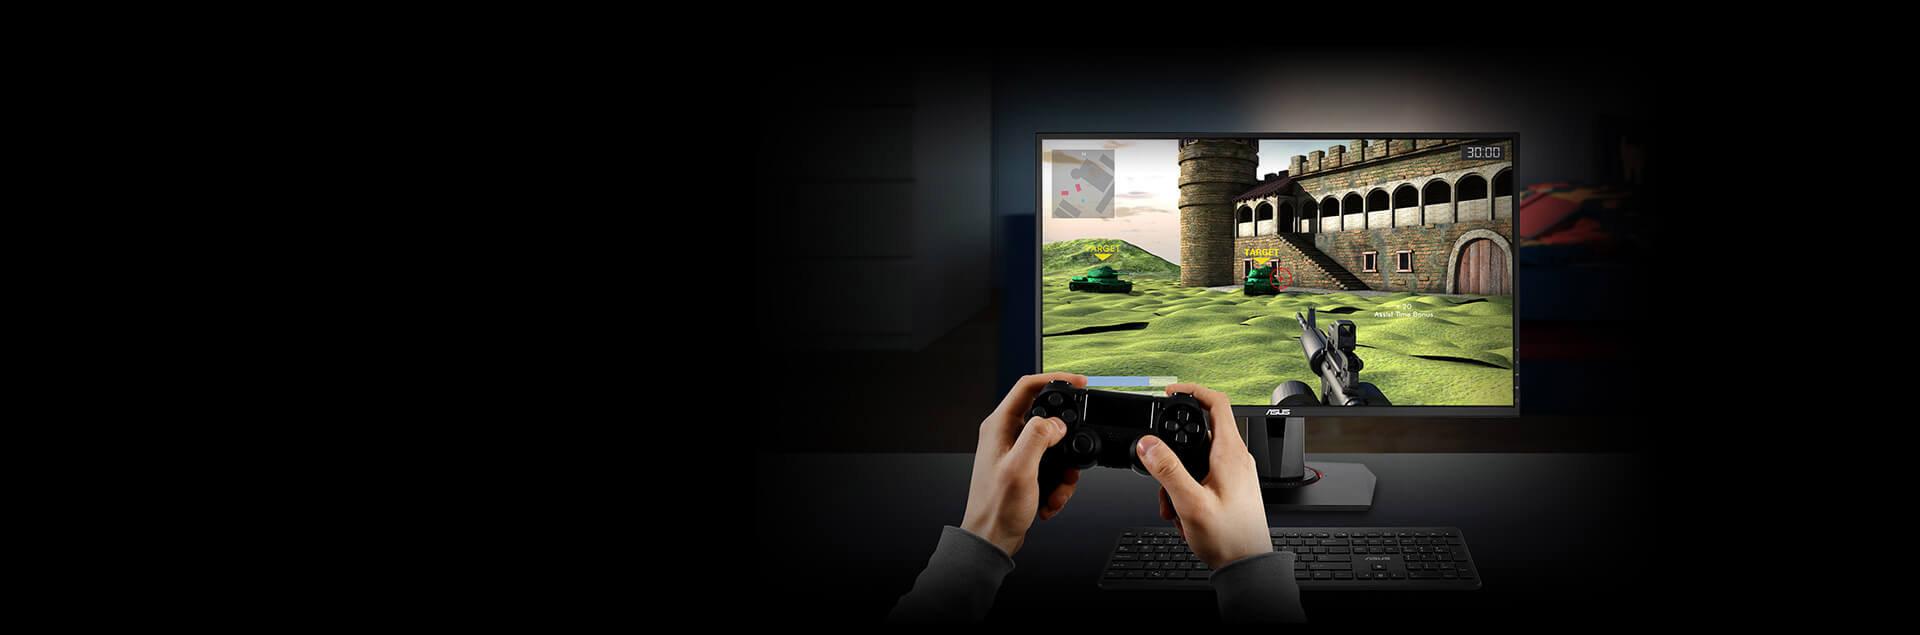 a man is playing shooting game as screenshot